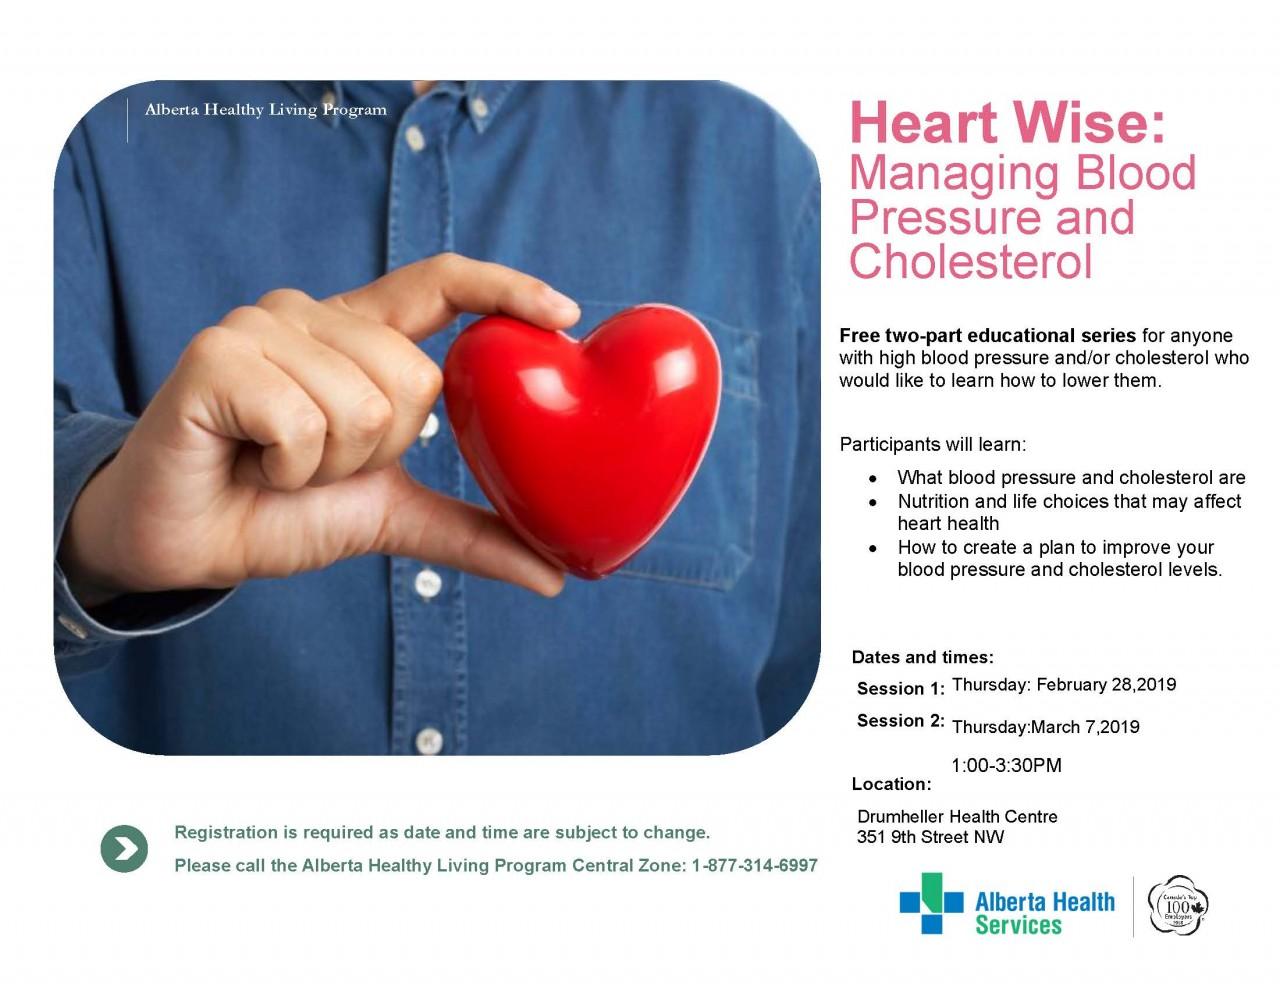 Heart-Wise---Drumheller-Feb-28-March-7-2019